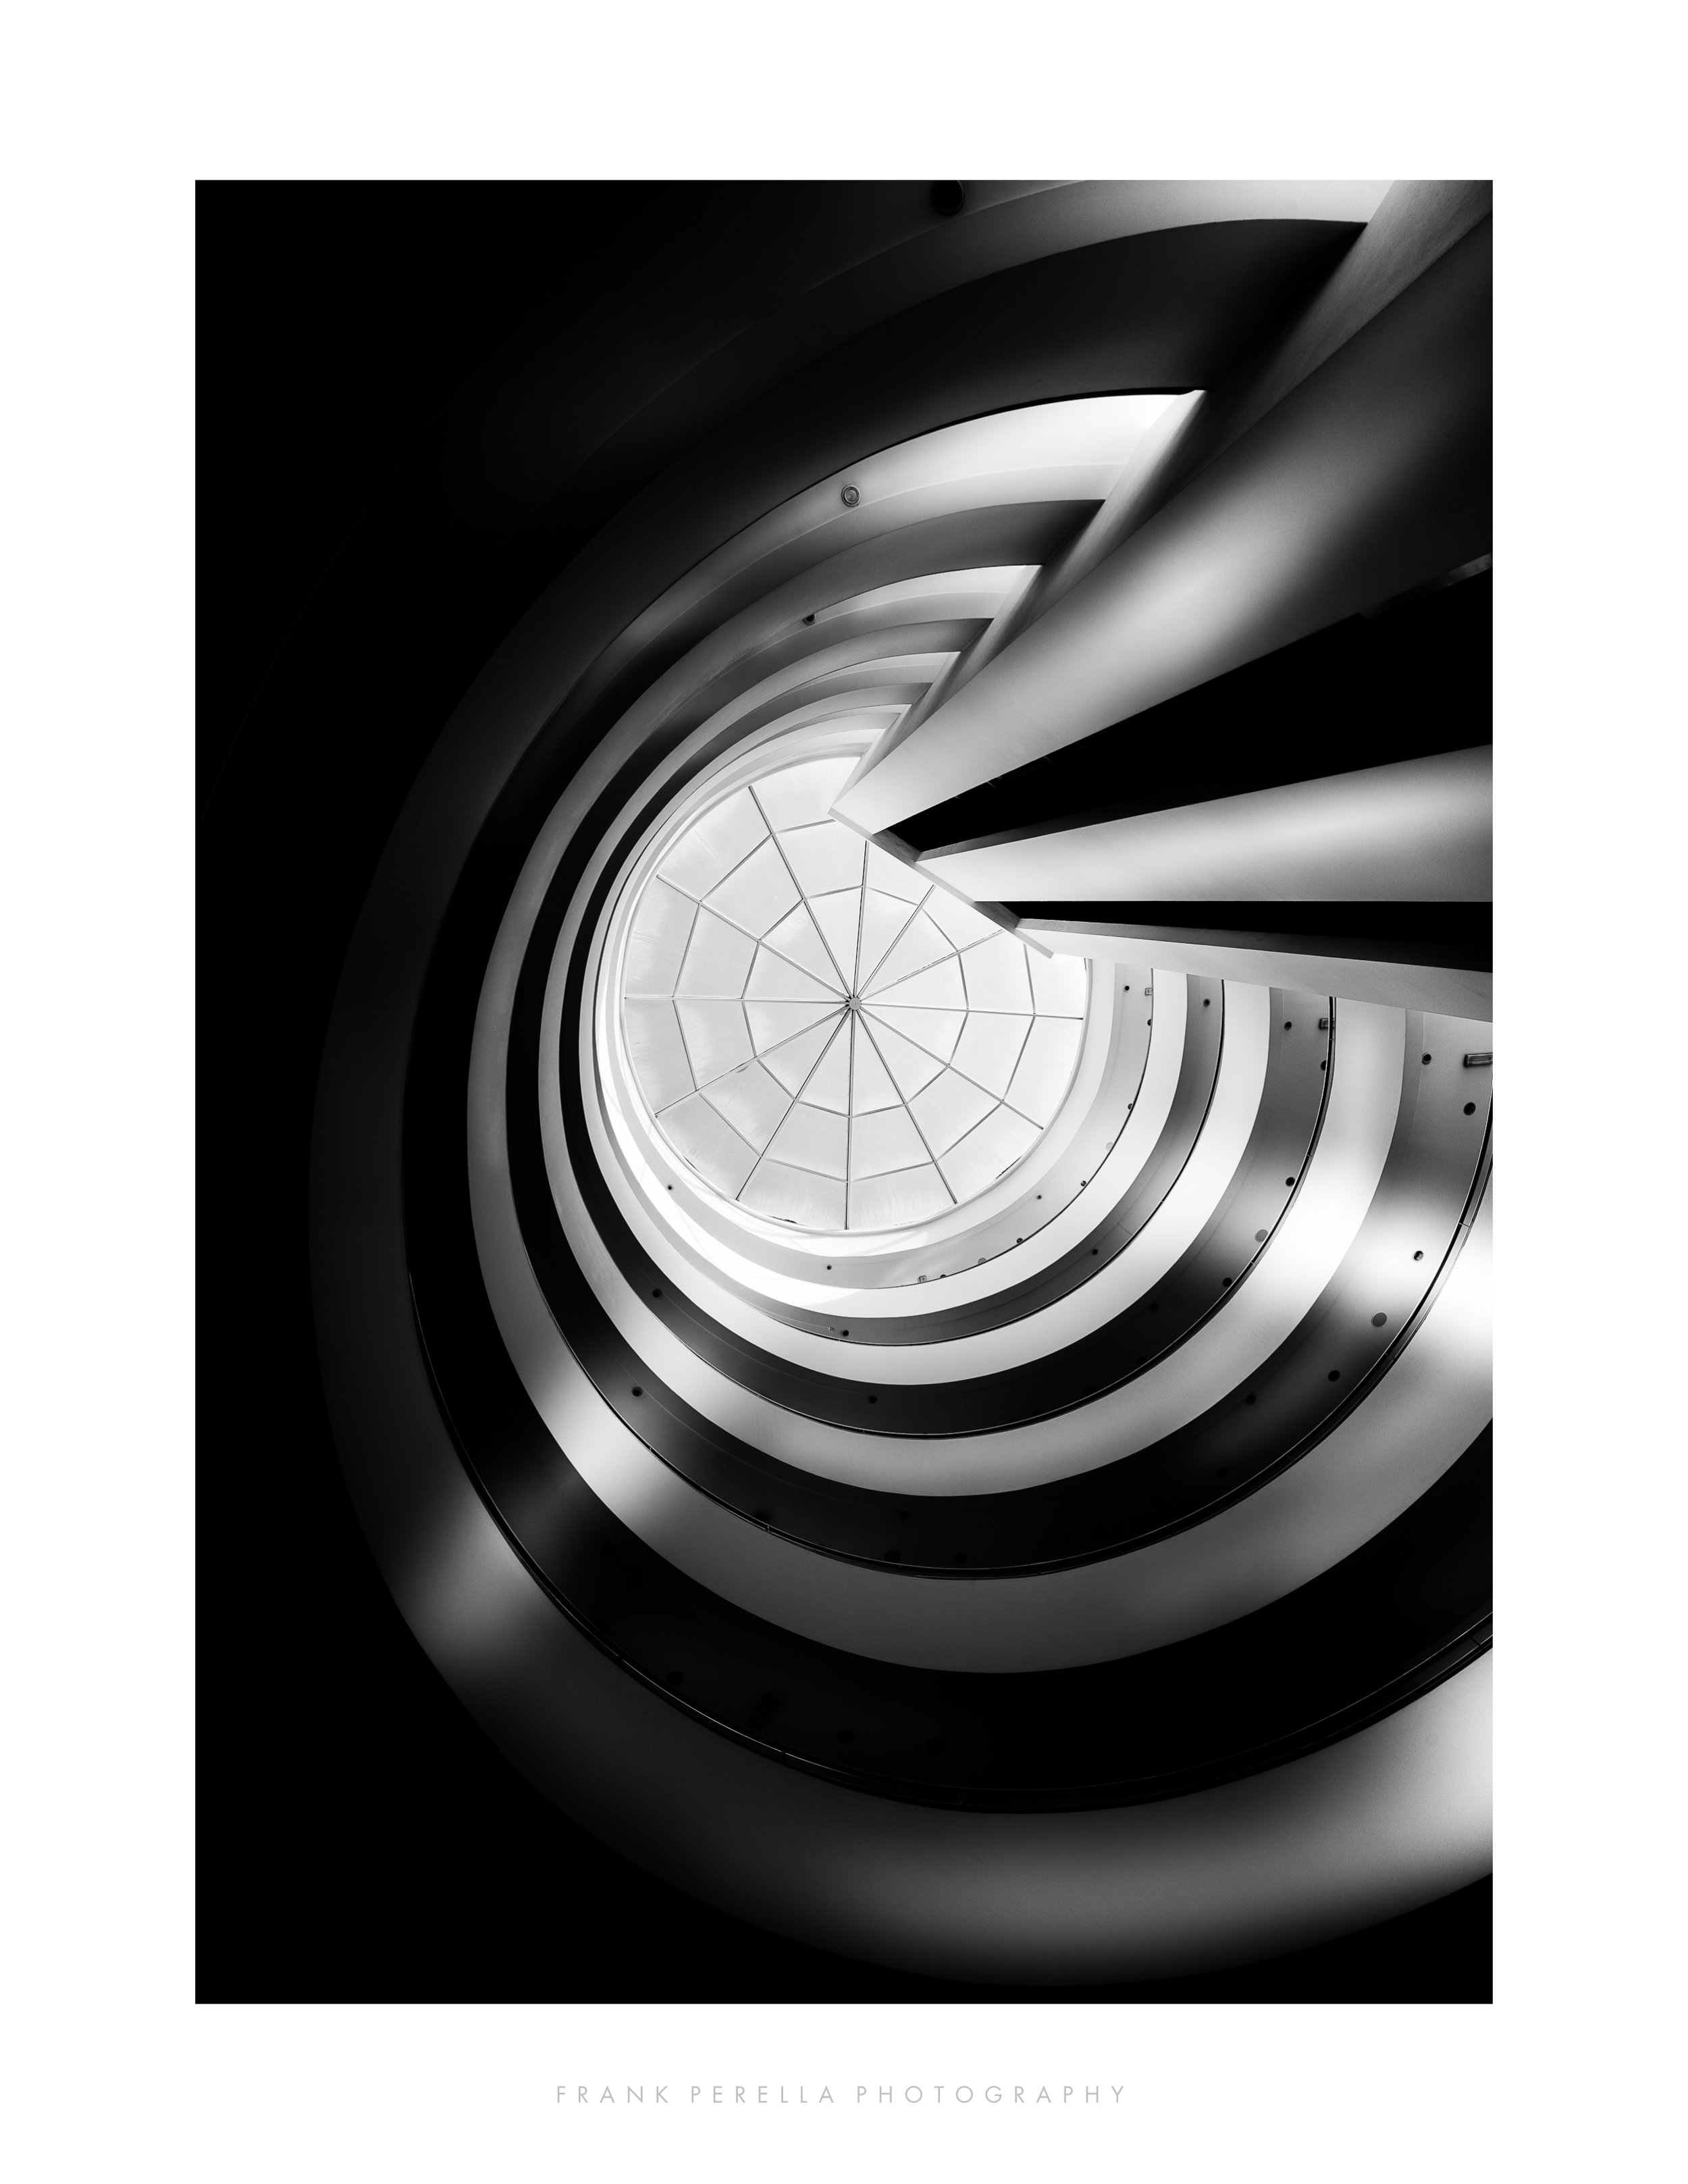 spiralling upwards